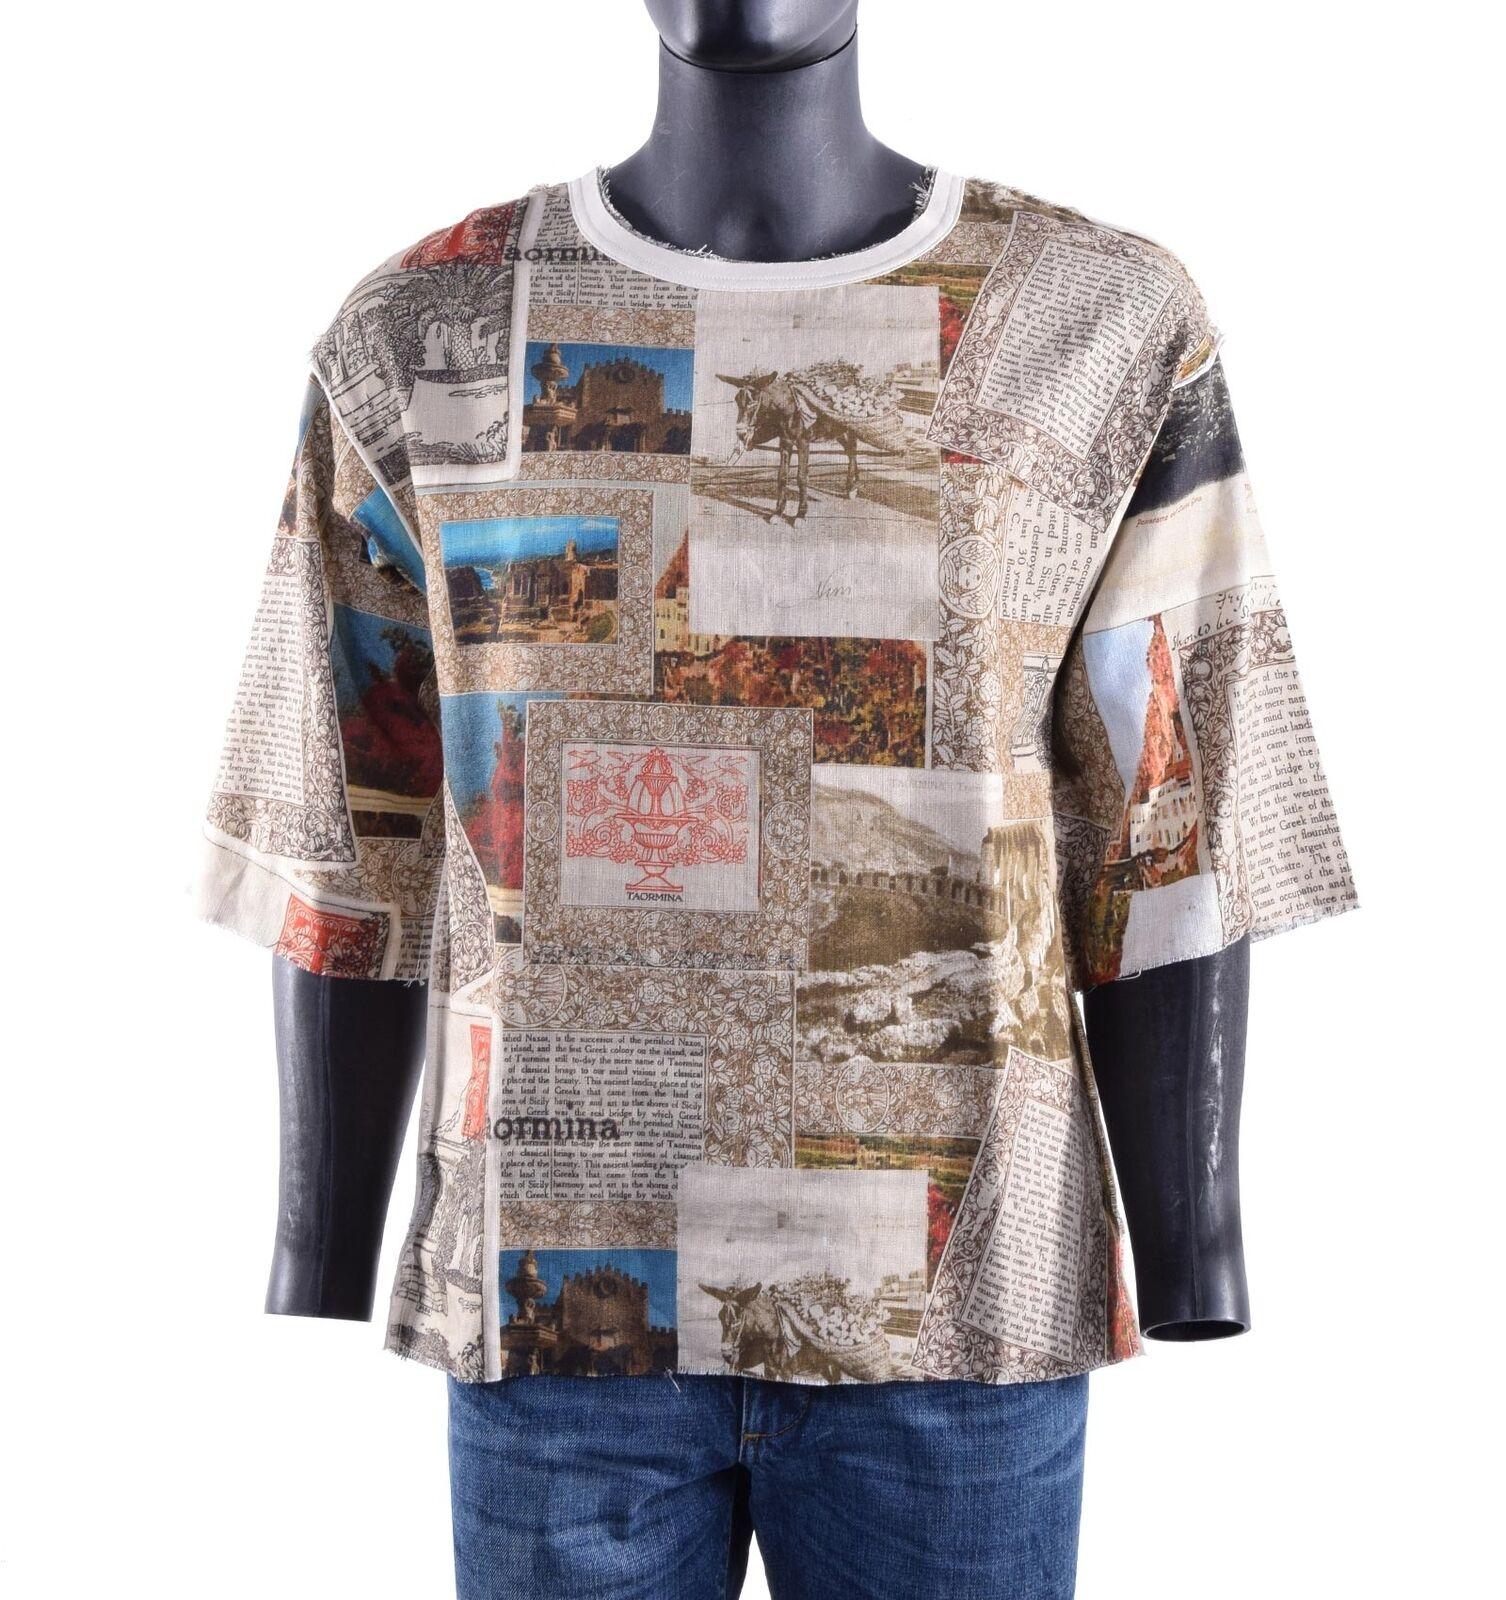 DOLCE & GABBANA RUNWAY Leinen T-Shirt mit Sizilien Taormina Print Beige 05680